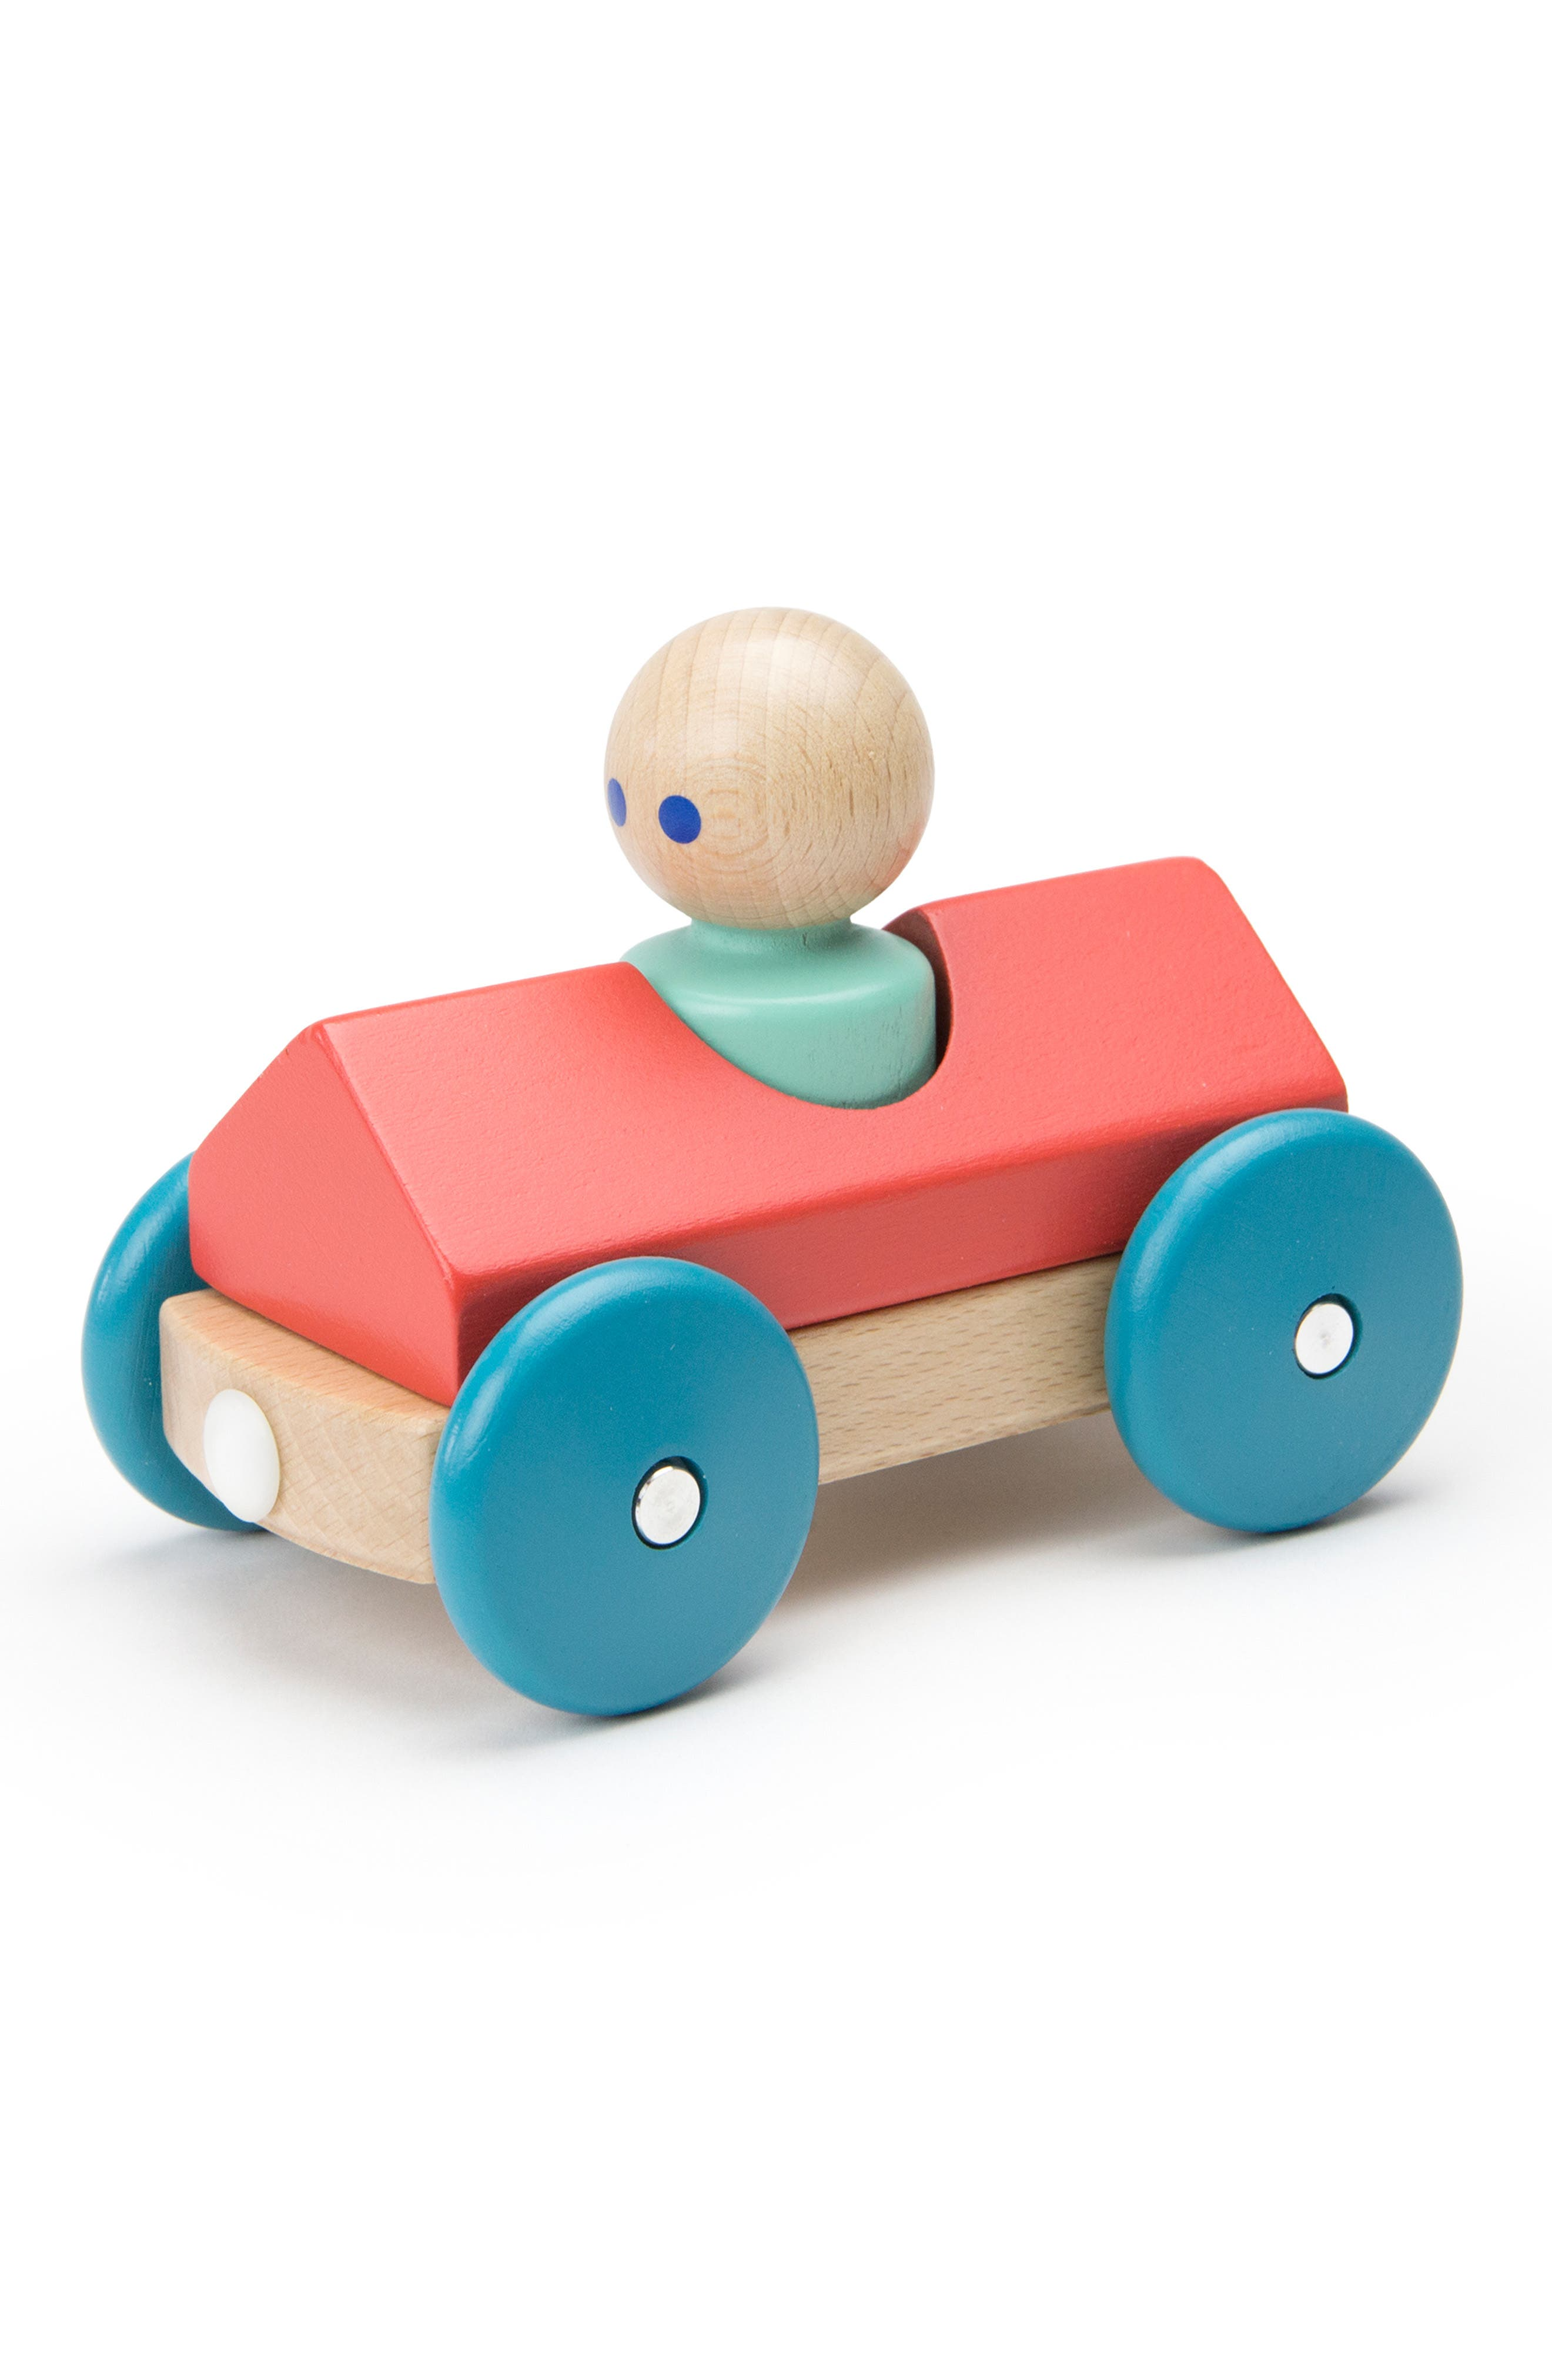 Barn Magnetic Racer Toy,                             Main thumbnail 1, color,                             RAINBOW